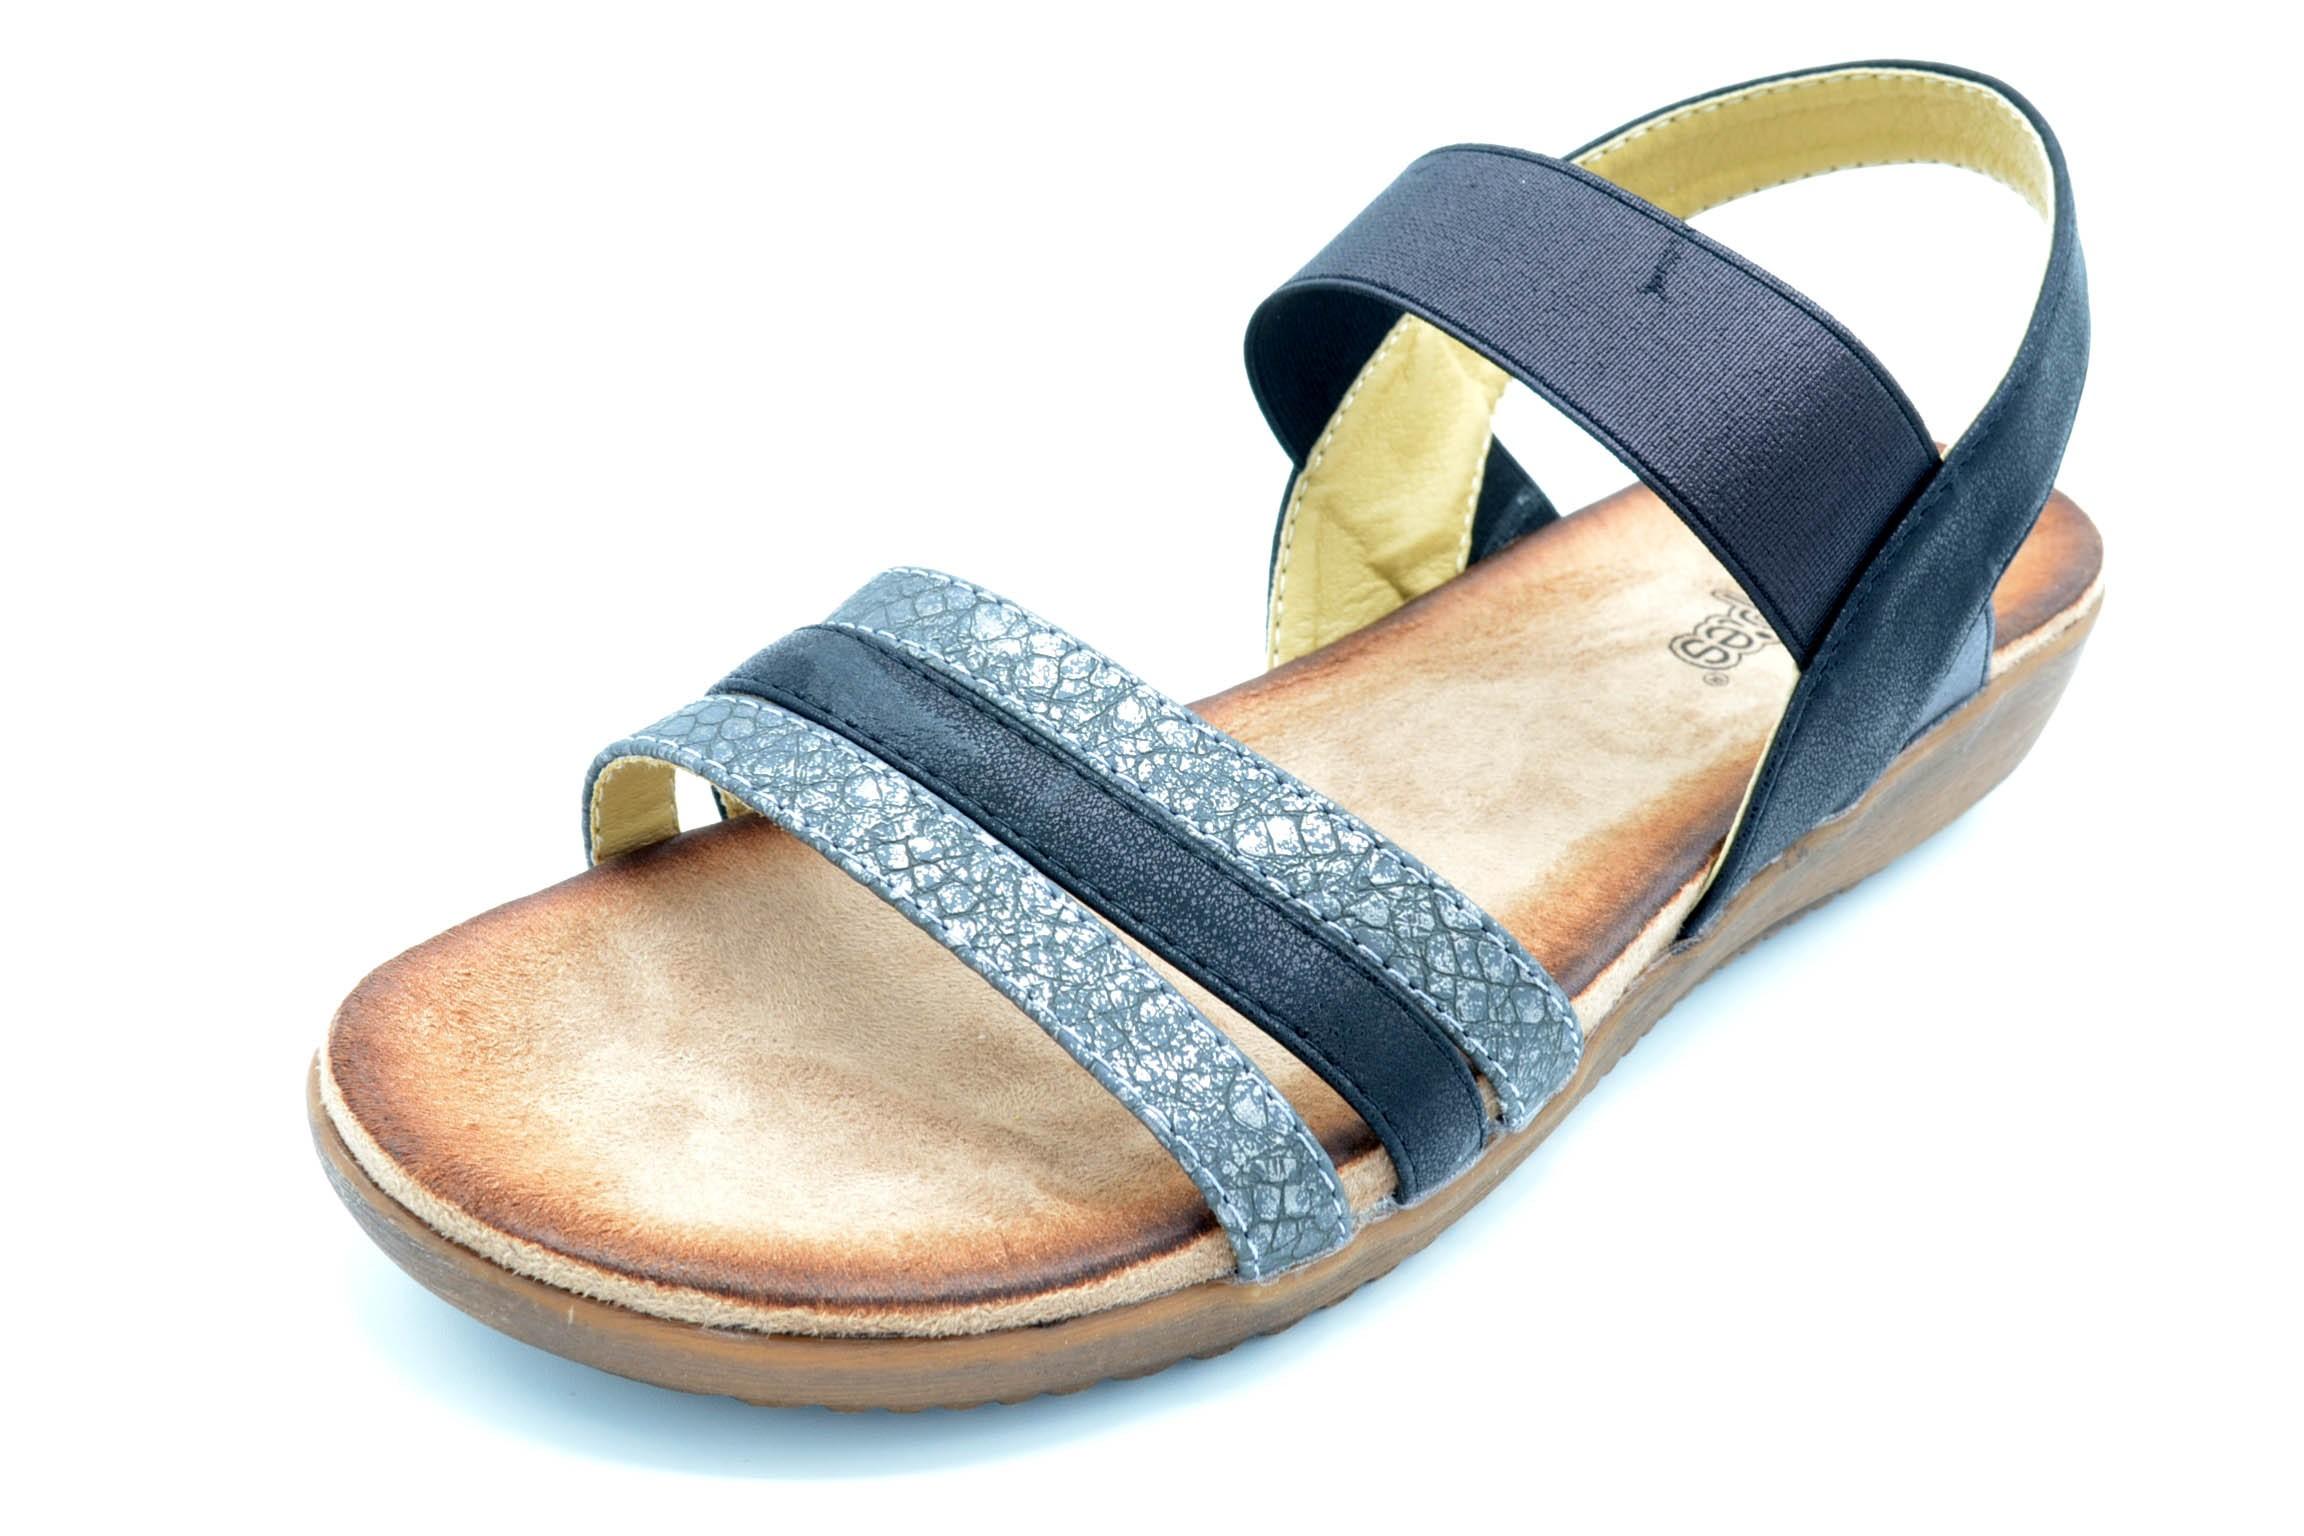 Sandalia Negro De Amarpies Mujer Abz12102 yb76gf